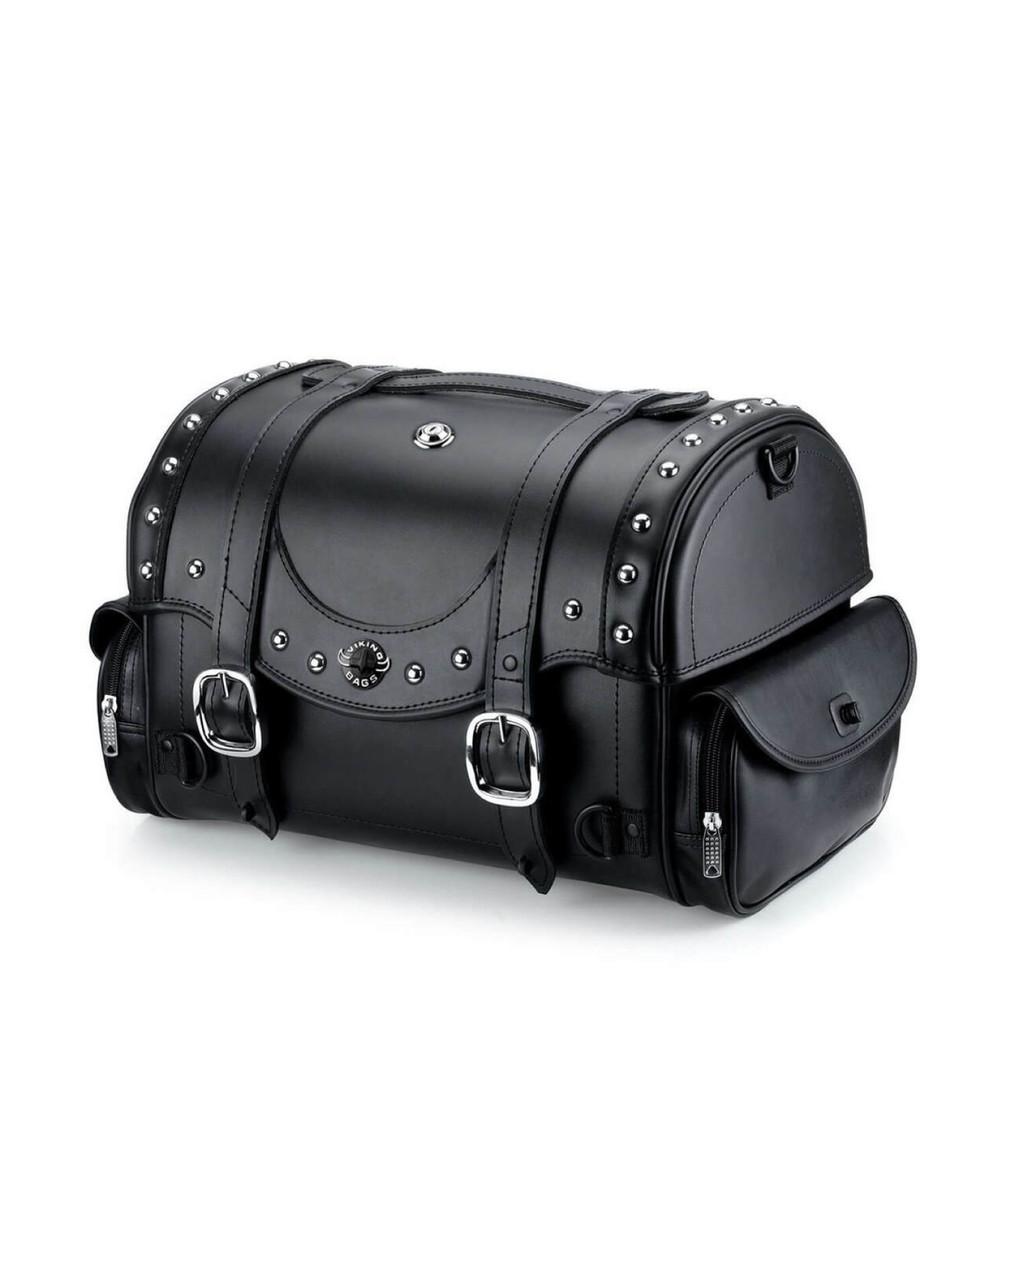 VikingBags Century Large Studded Suzuki Leather Motorcycle Roll Bag Main Bag View